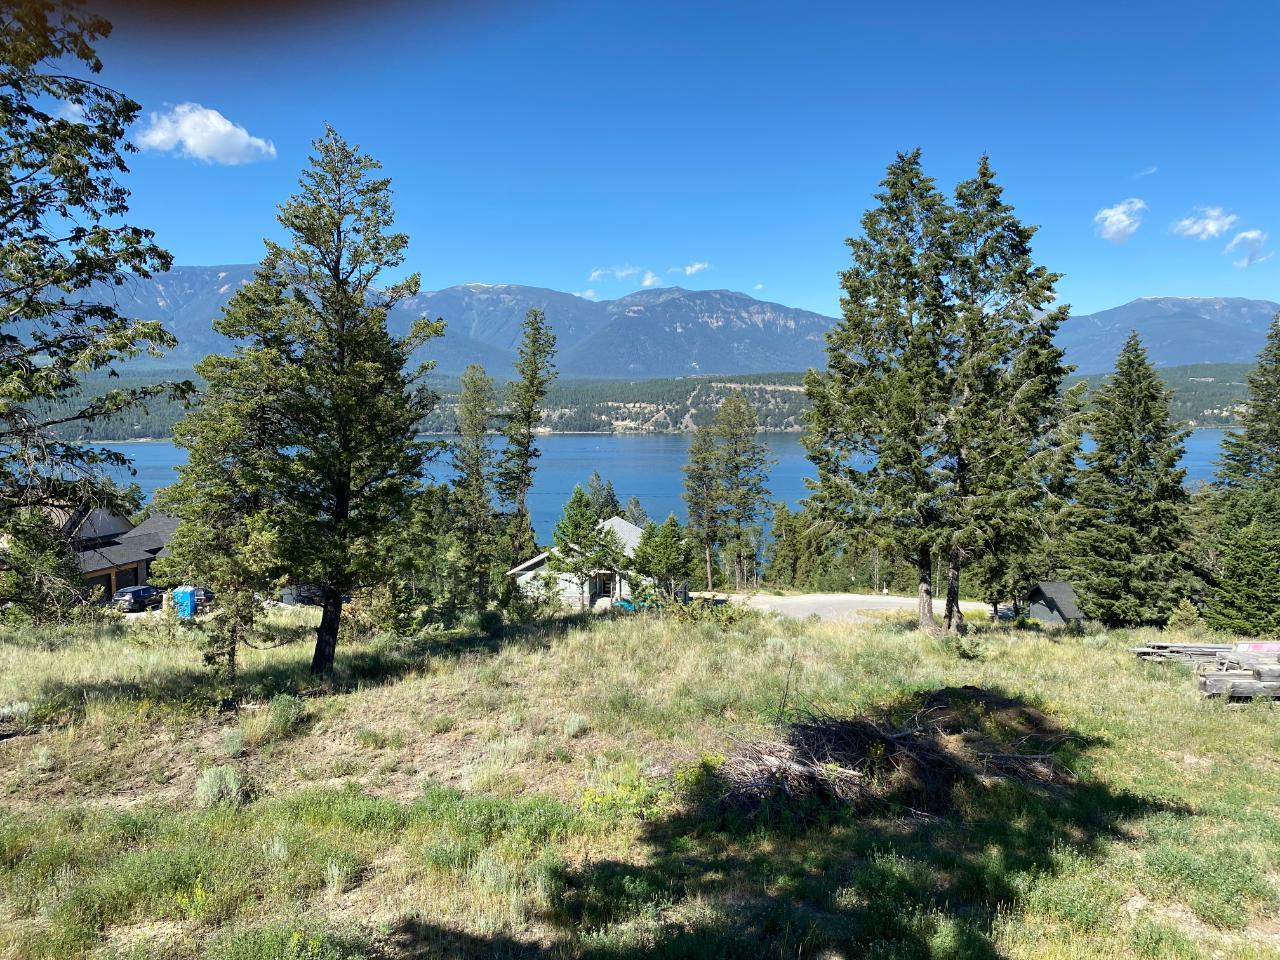 Lot 2 Stoddart Estates Drive, Windermere, British Columbia  V0B 2L0 - Photo 1 - 2451195